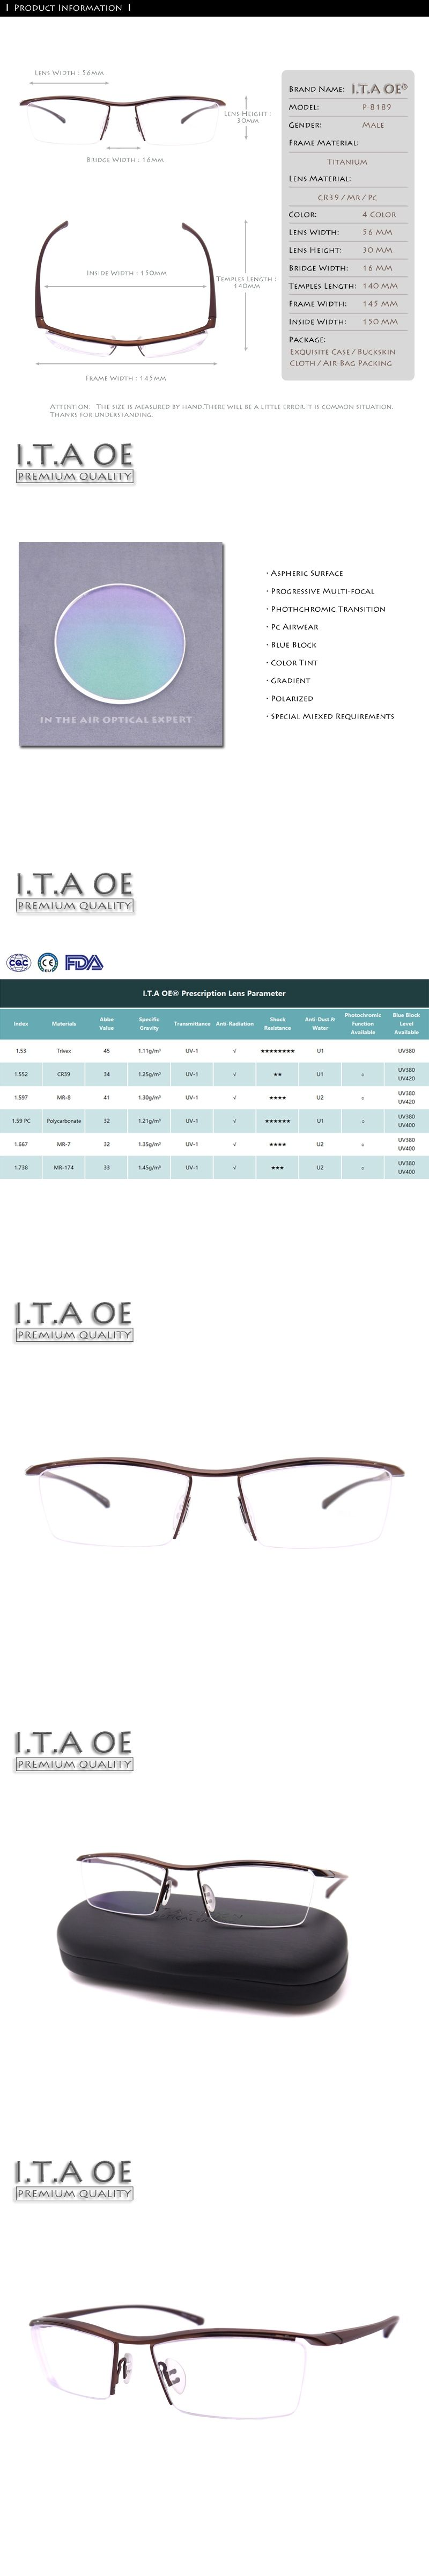 d46eca6310 ITAOE Model 8189 Quality Alloy TR90 Men Optical Prescription Glasses  Eyewear Frames Spectacles 145mm